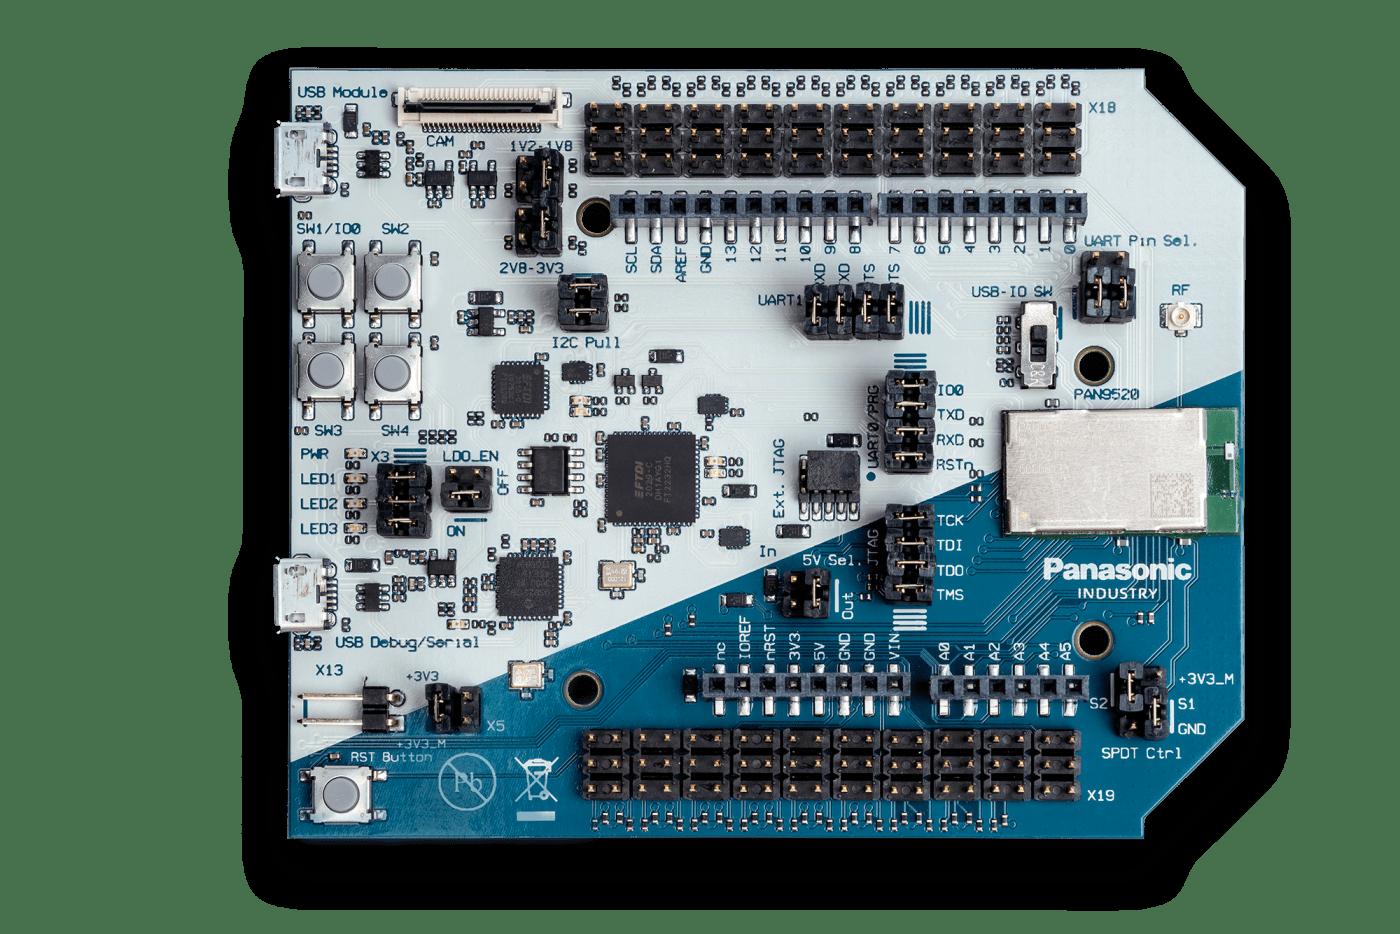 Panasonic Industry's PAN9520 Wi-Fi module